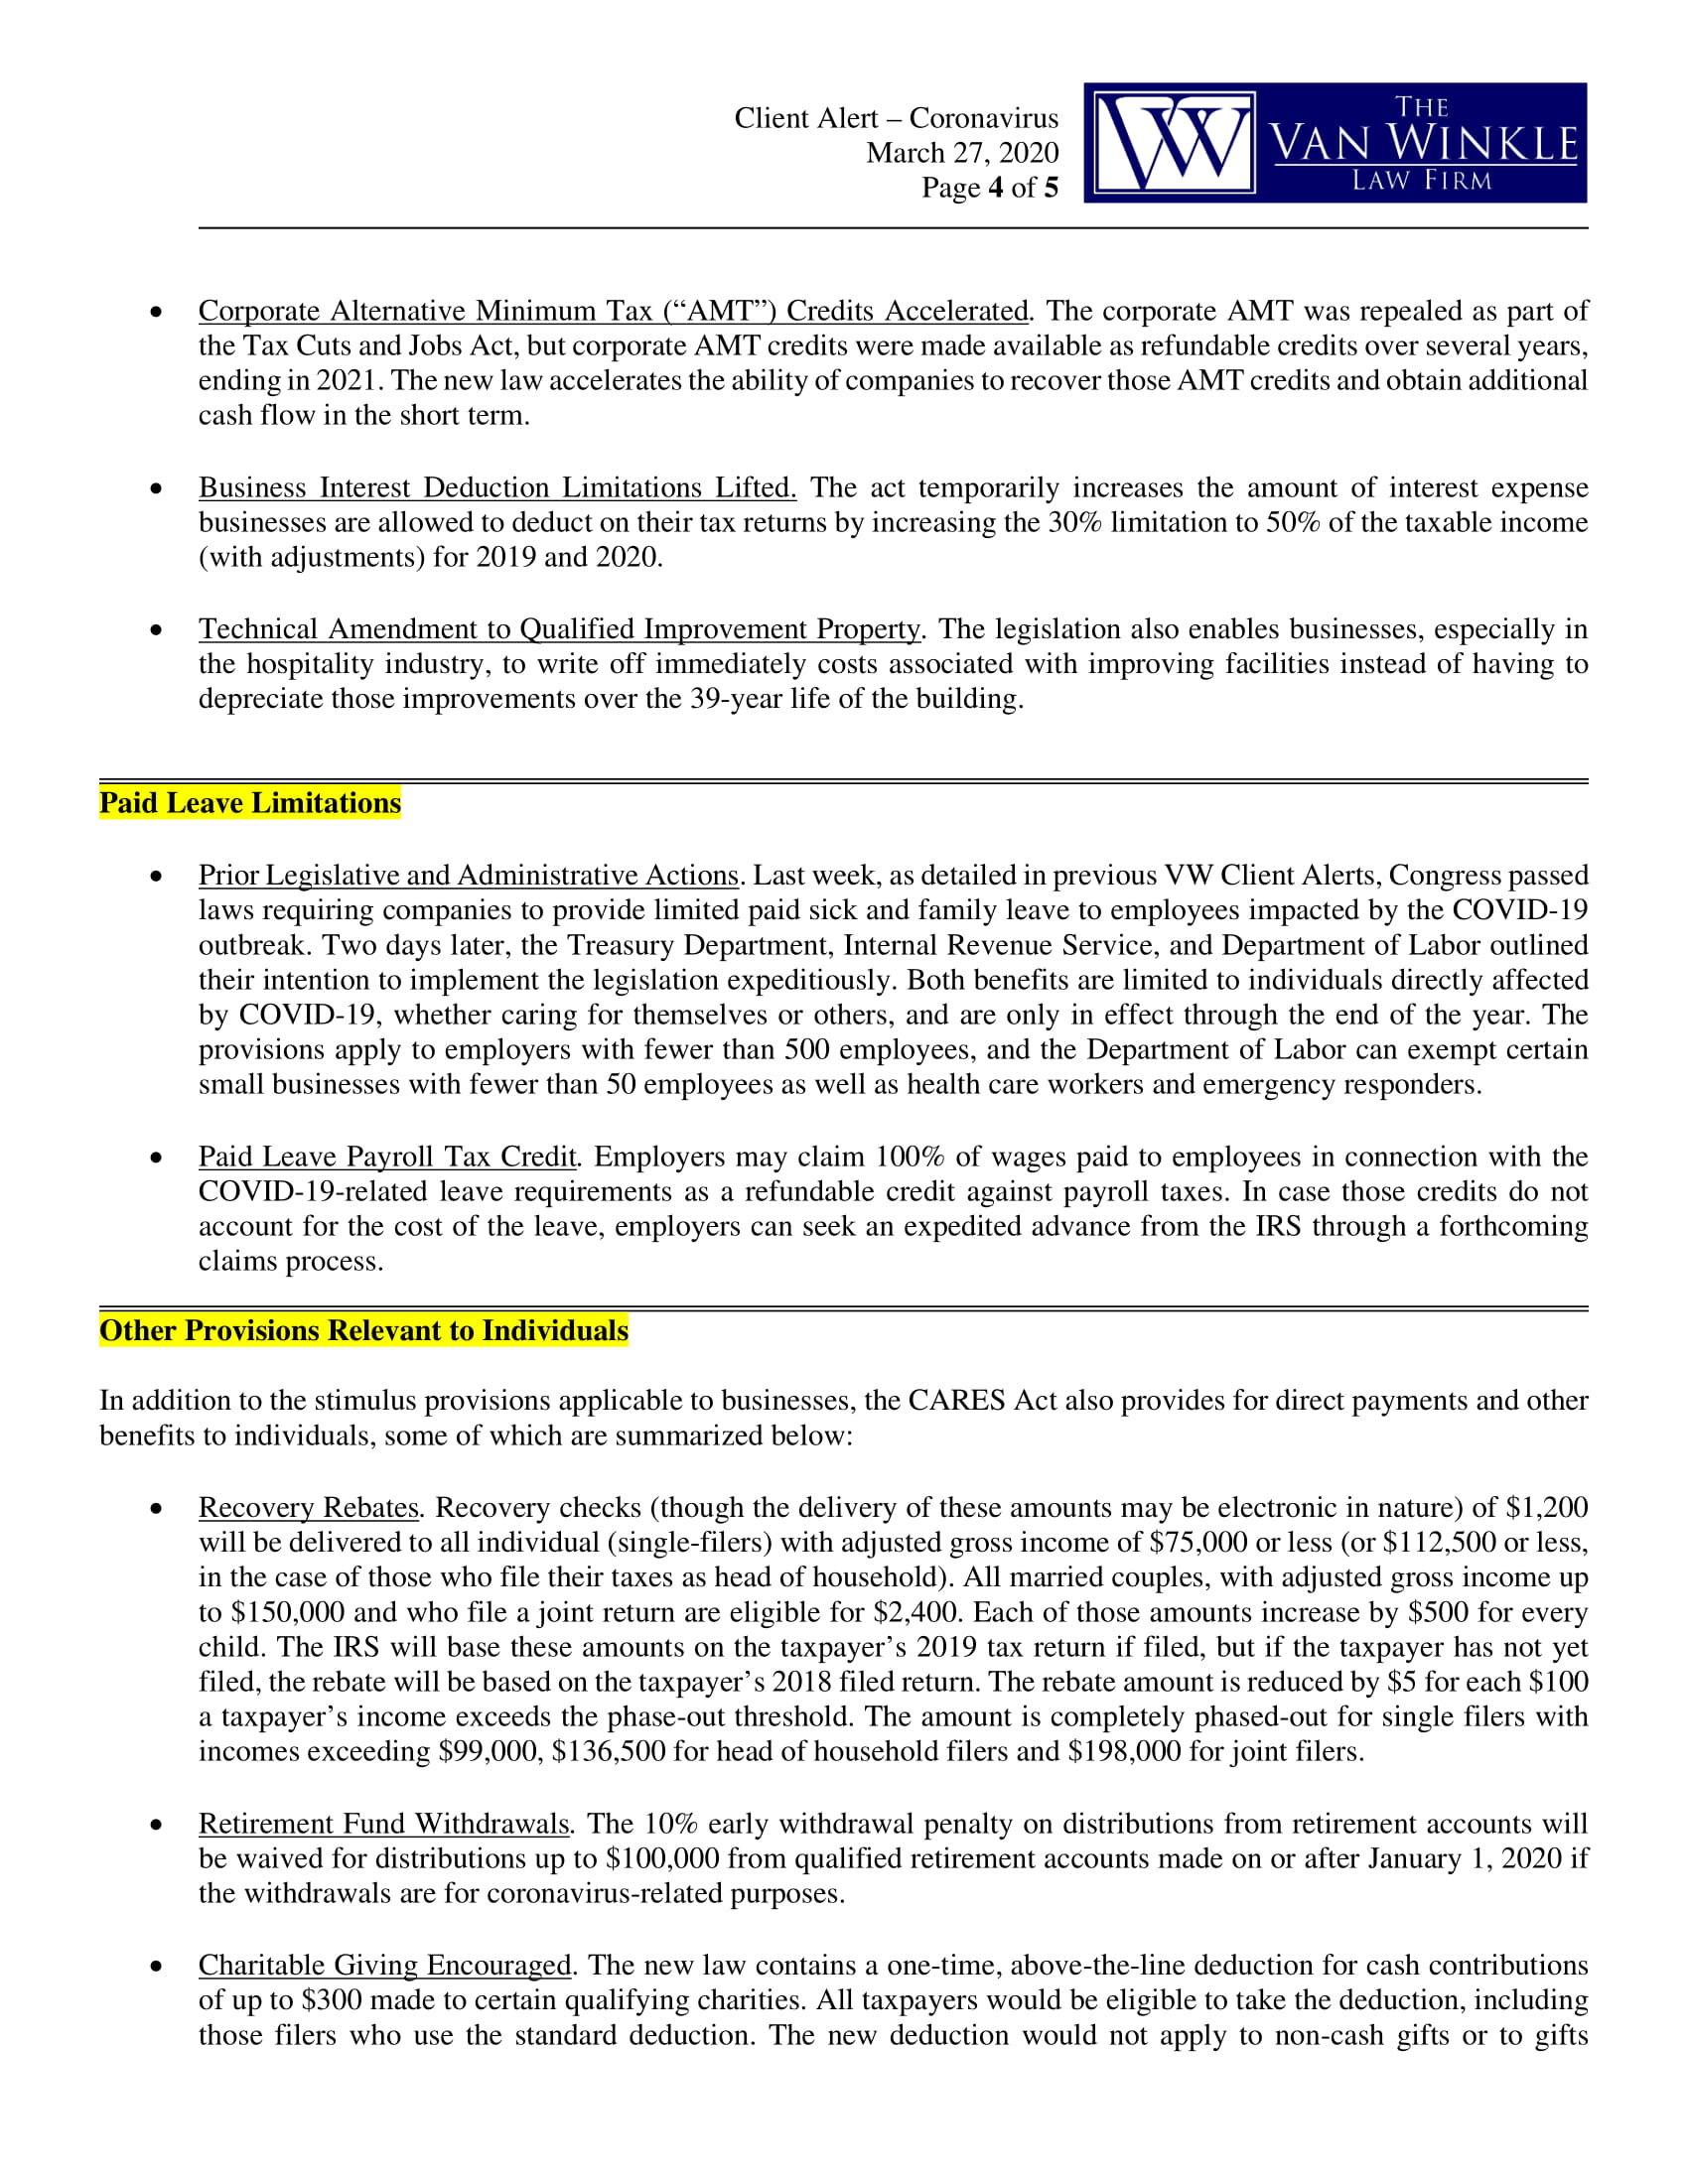 Phase 3 Coronavirus Relief Page 4